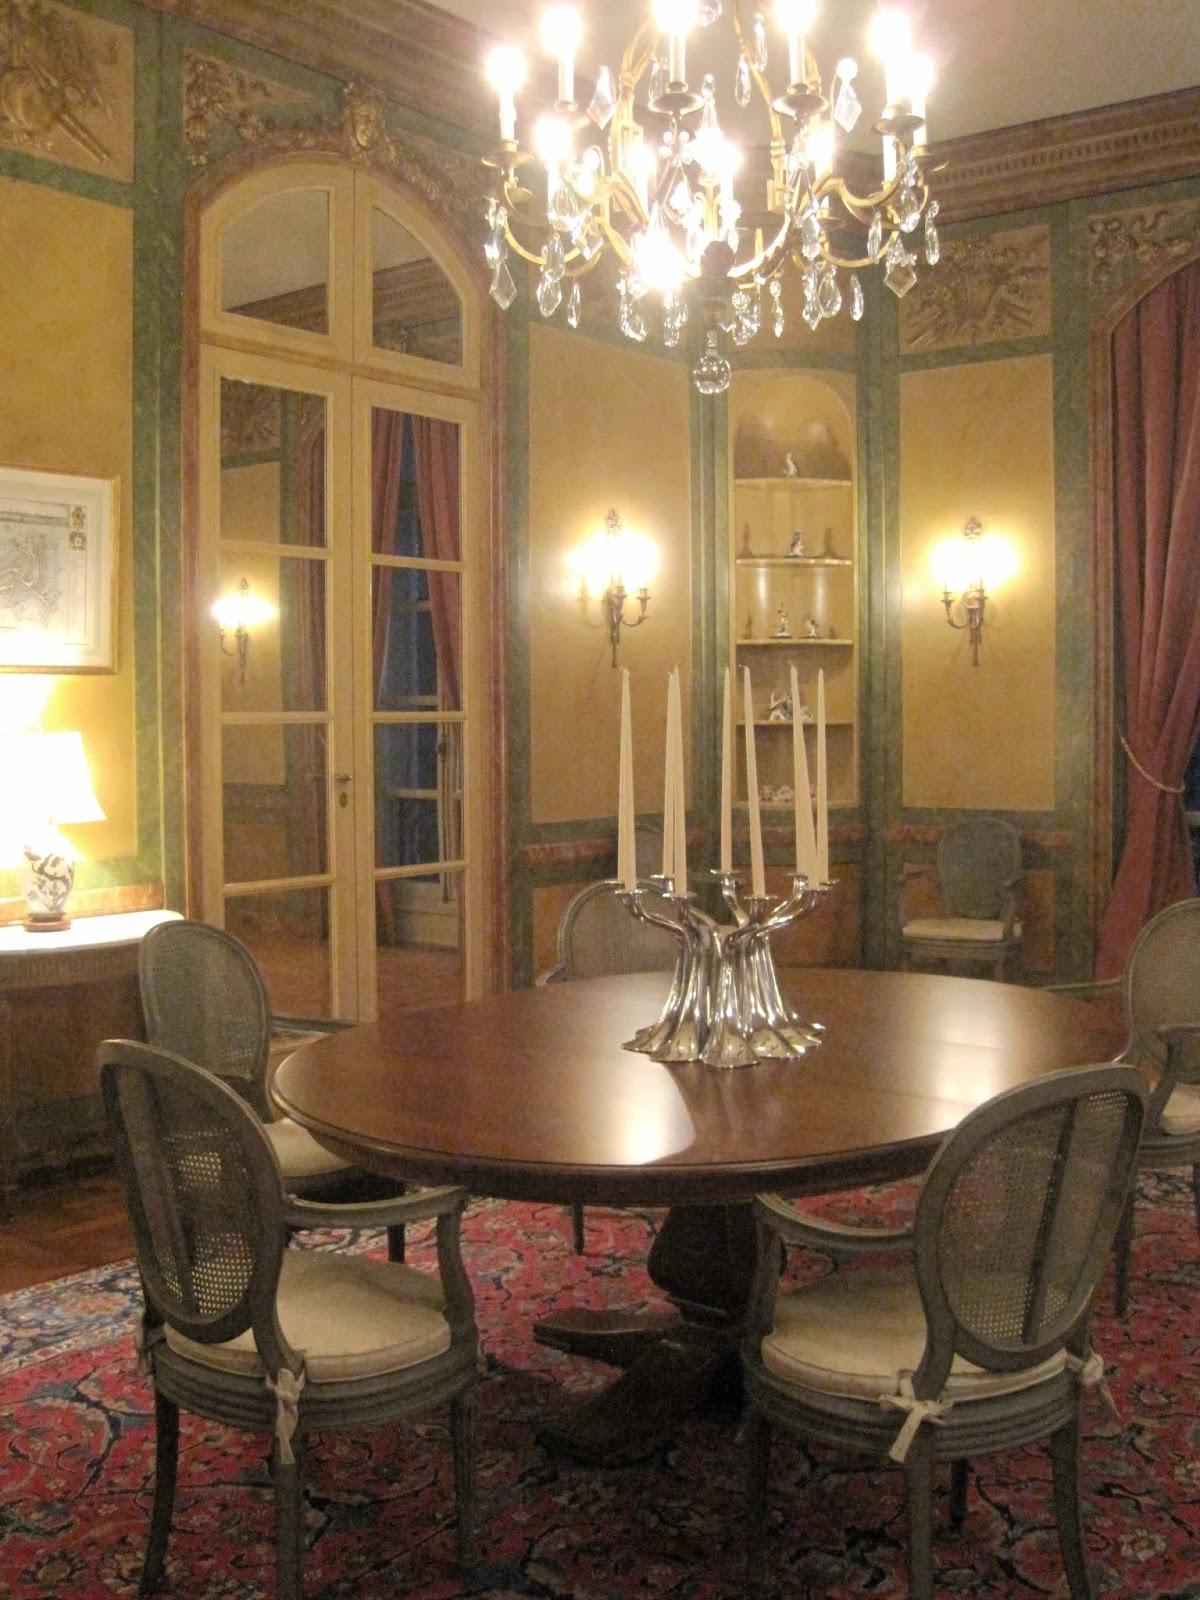 Belgian ambassador\'s residence interiors 2: Salon & Dining Rooms ...